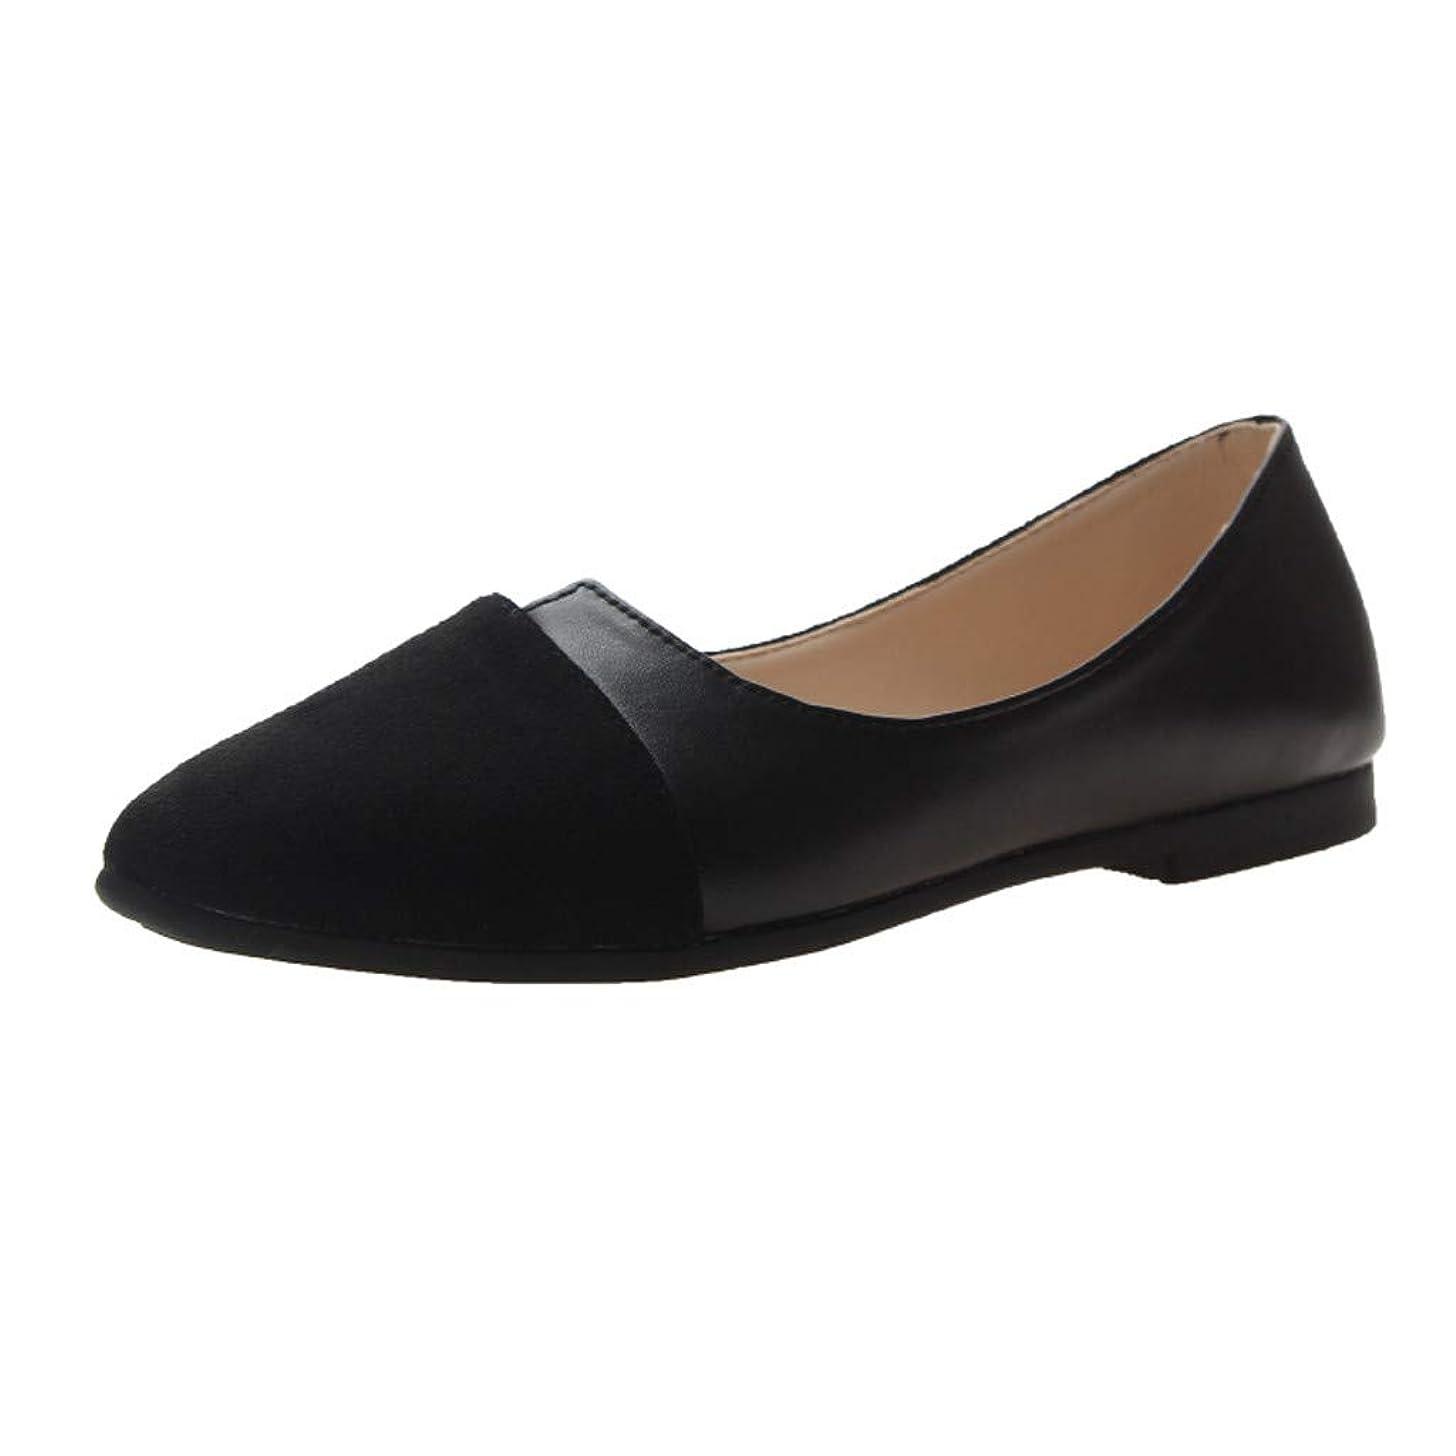 Duseedik Women's Lazy Shoes Contrast Color Flats Pointed Toe Ballerina Ballet Flat Slip On Shoes